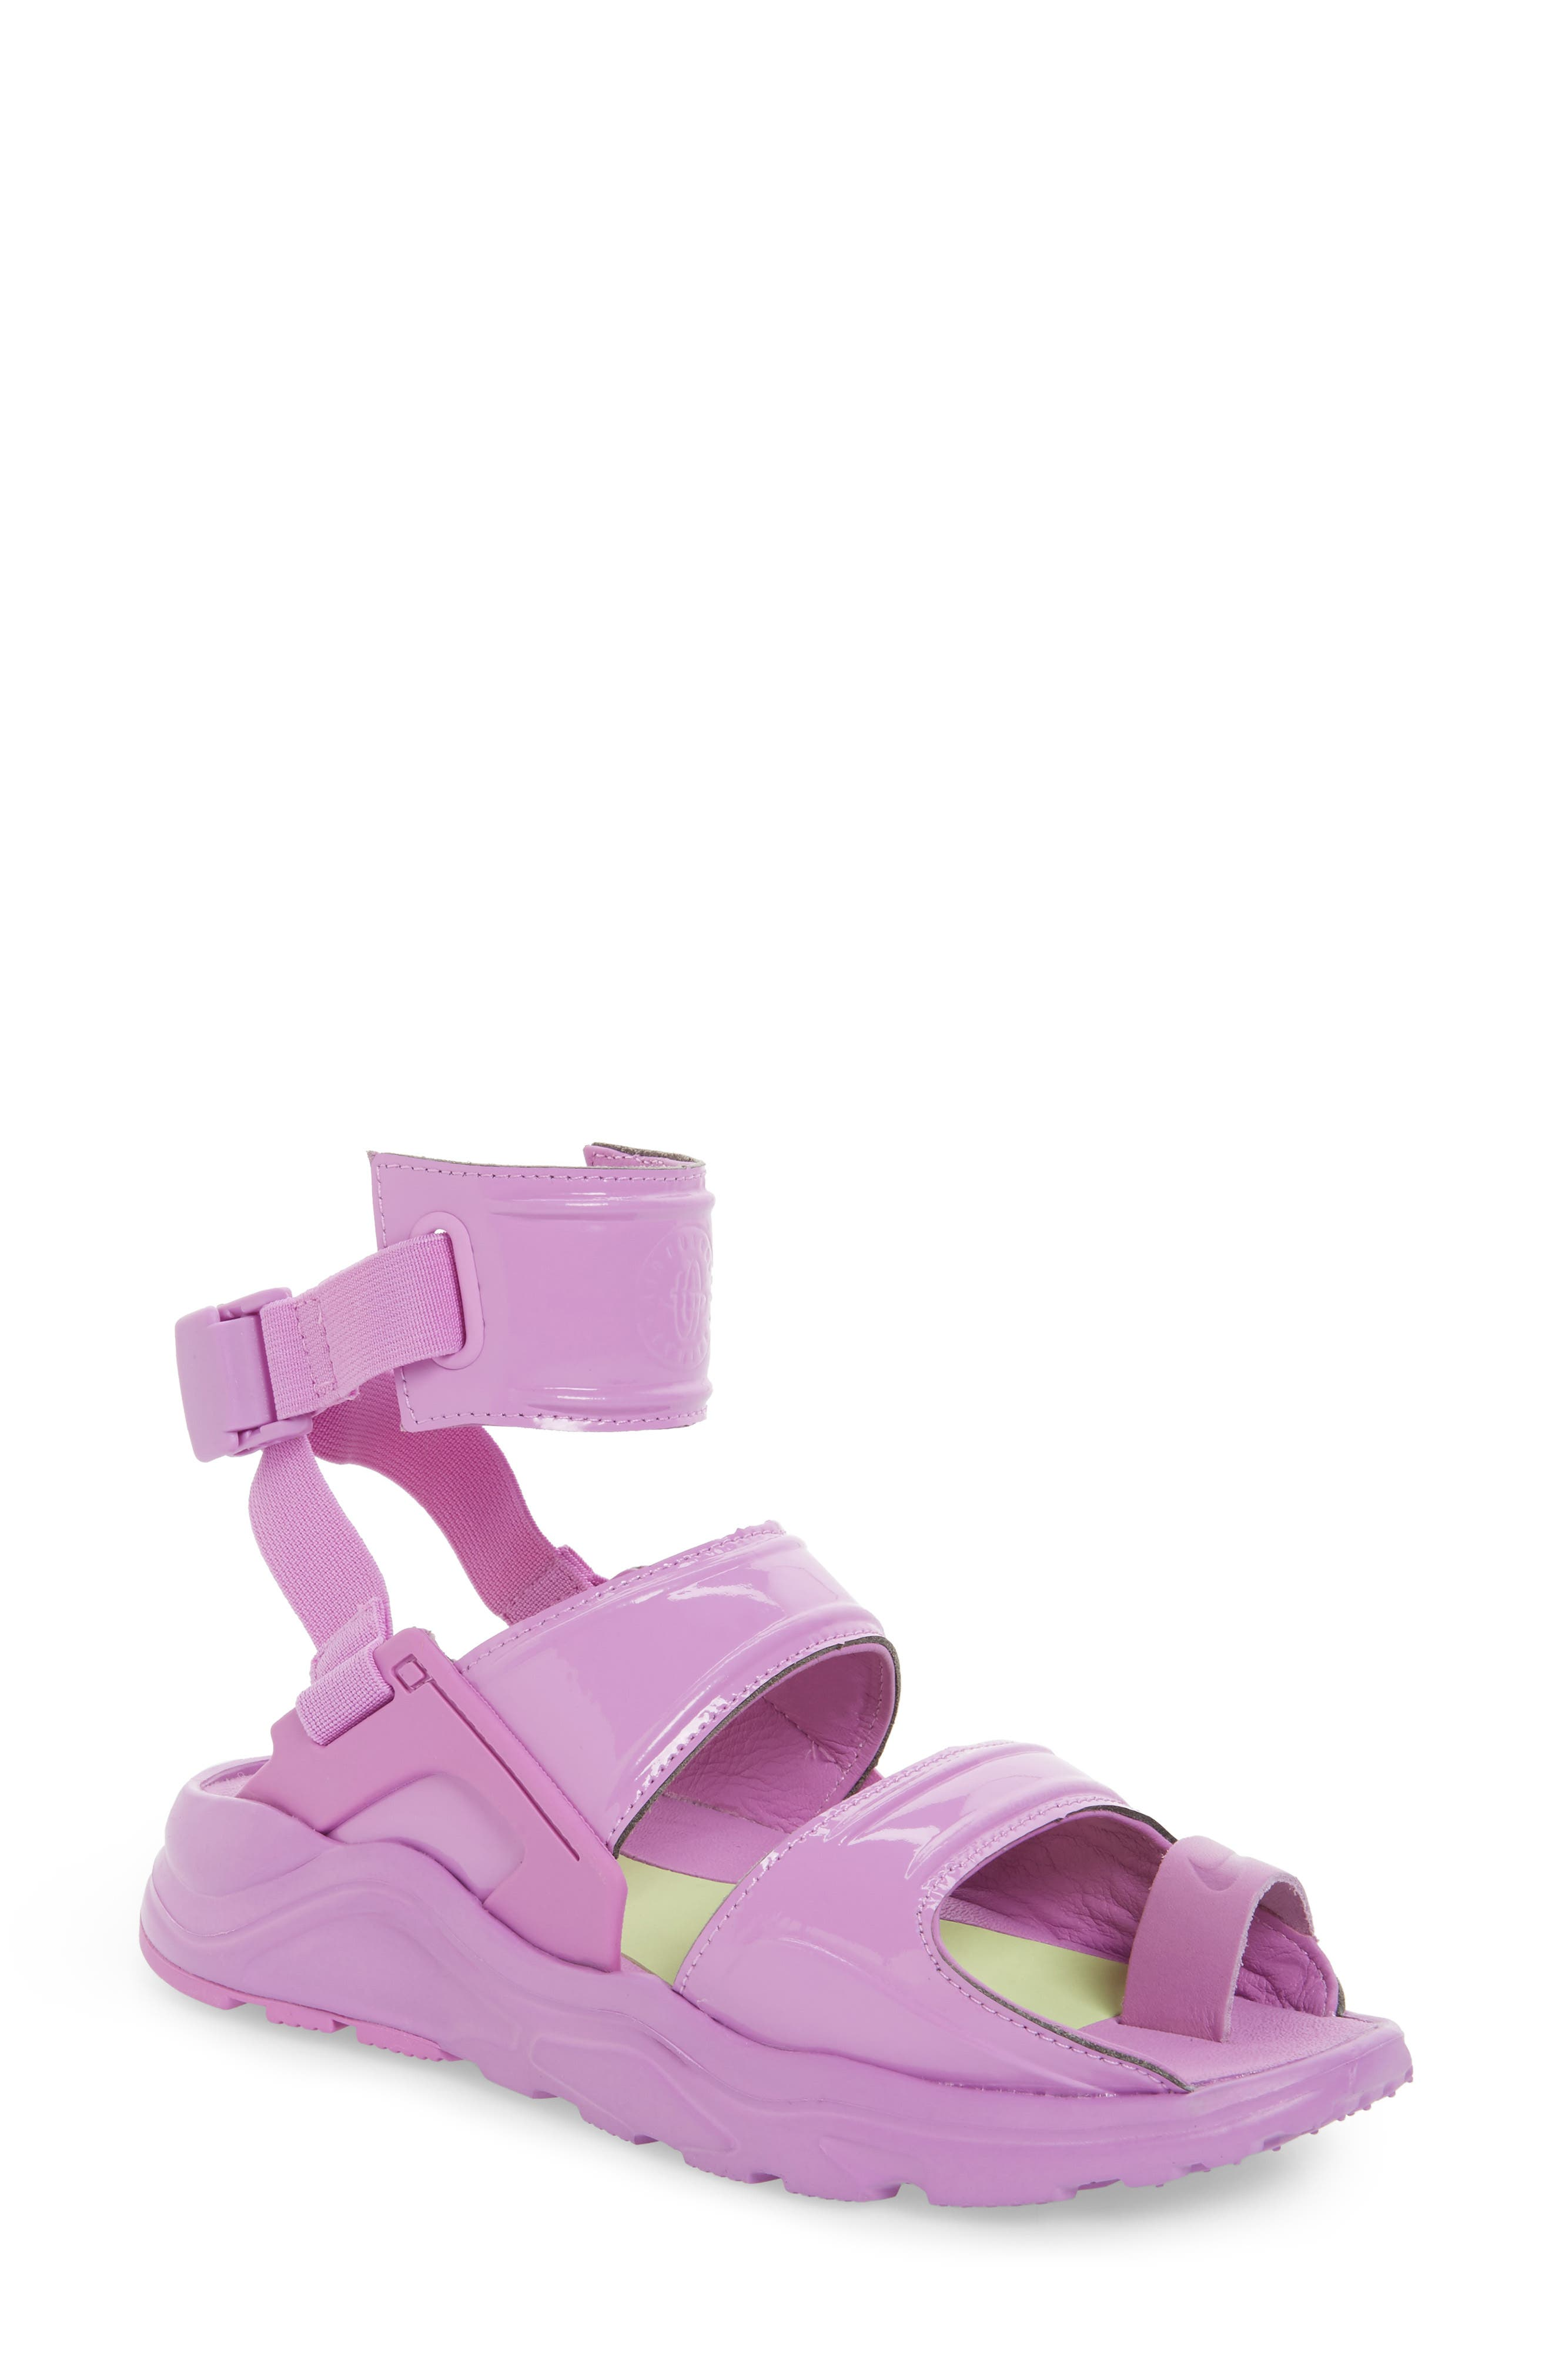 Air Huarache Gladiator Sandal,                         Main,                         color, Fuchsia Glow